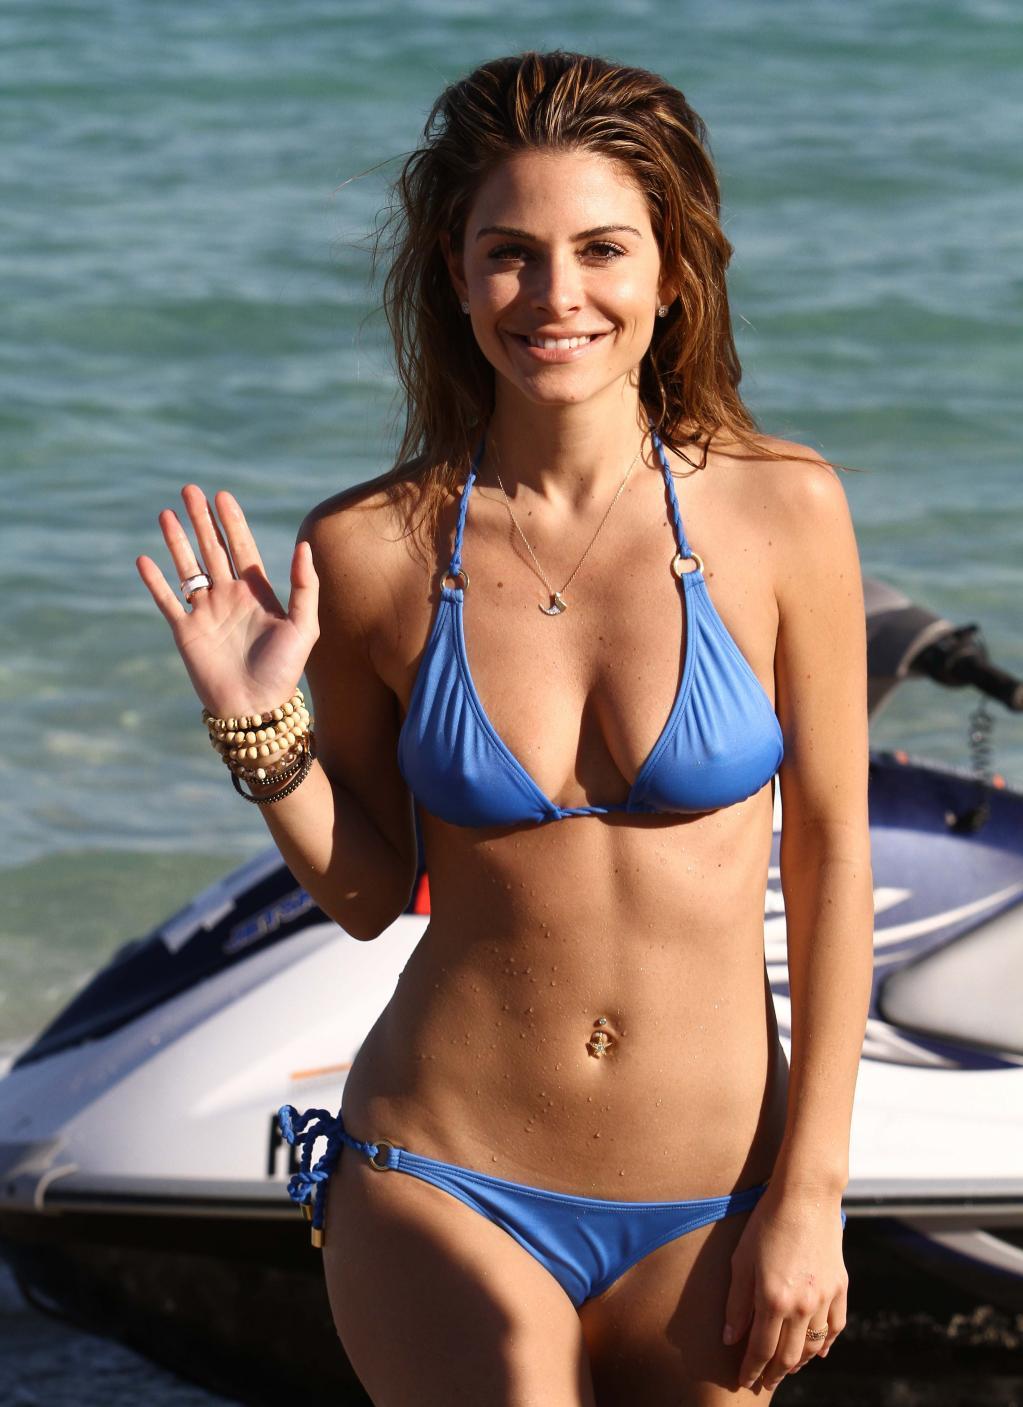 Maria Menounos' Sexiest Bikini Looks - Maria Menounos Bikini - 4